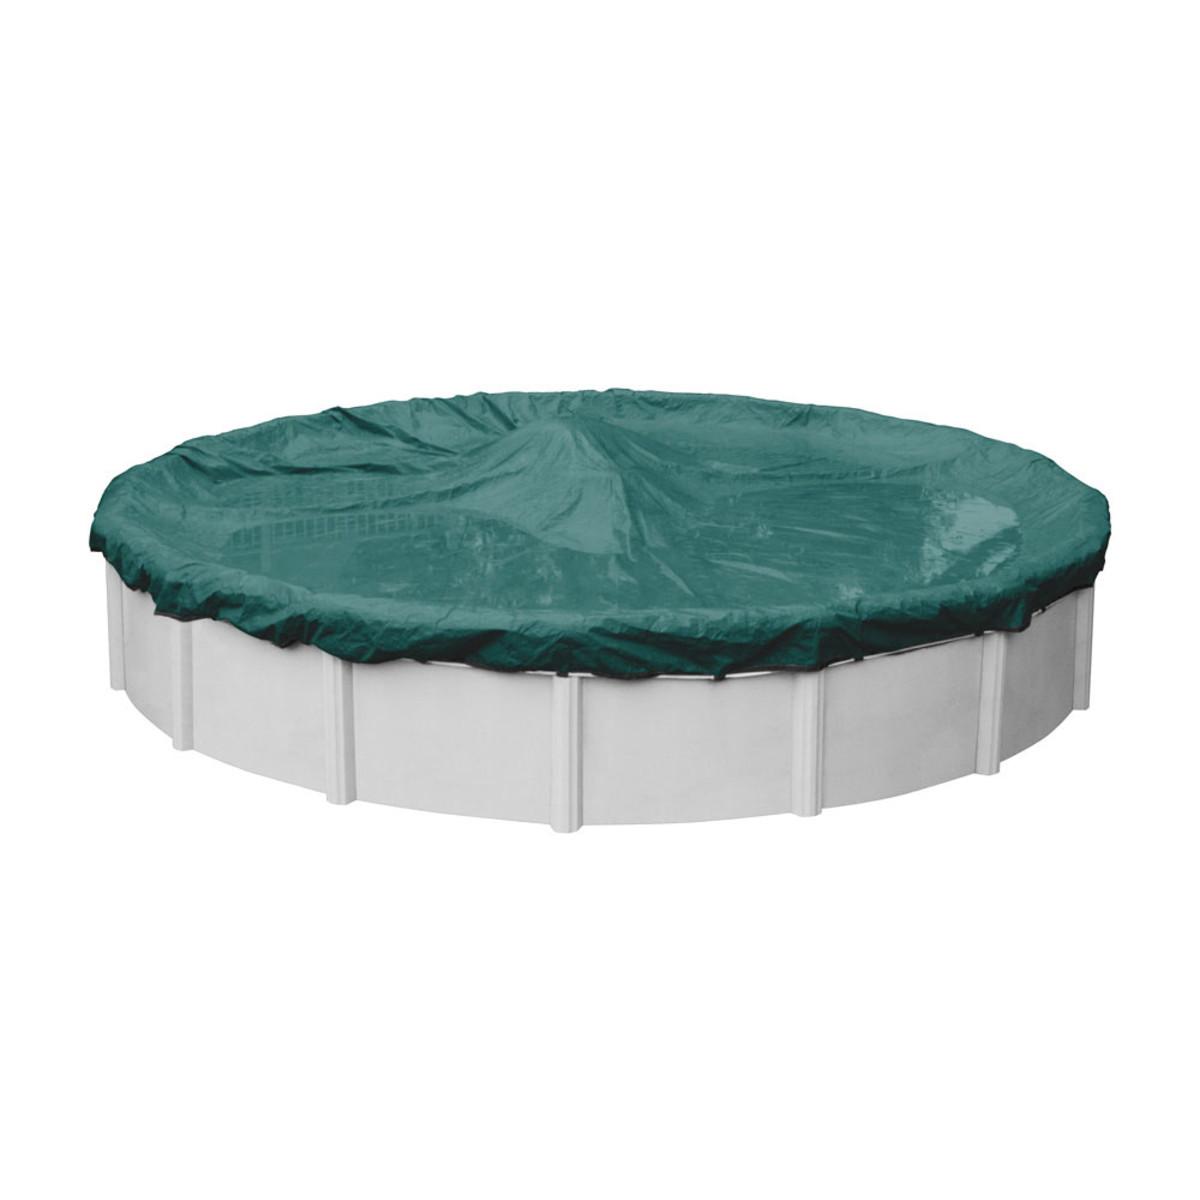 24 39 Round Supreme Plus Teal Pool Cover Splash Super Center